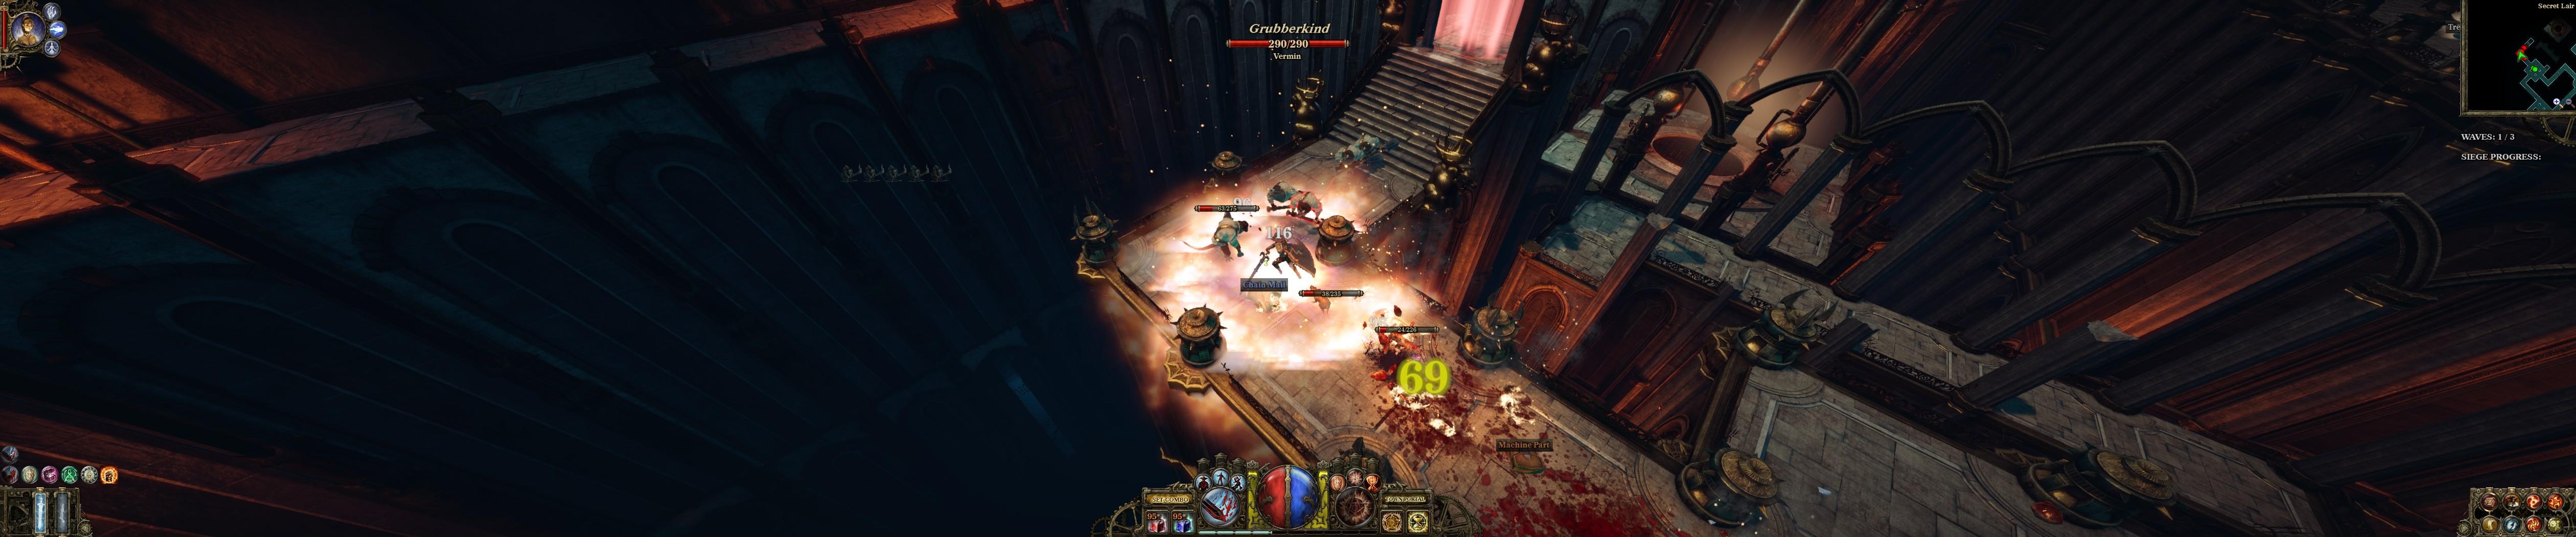 Monster-Horden beseitigt Van Helsing besonders eindrucksvoll